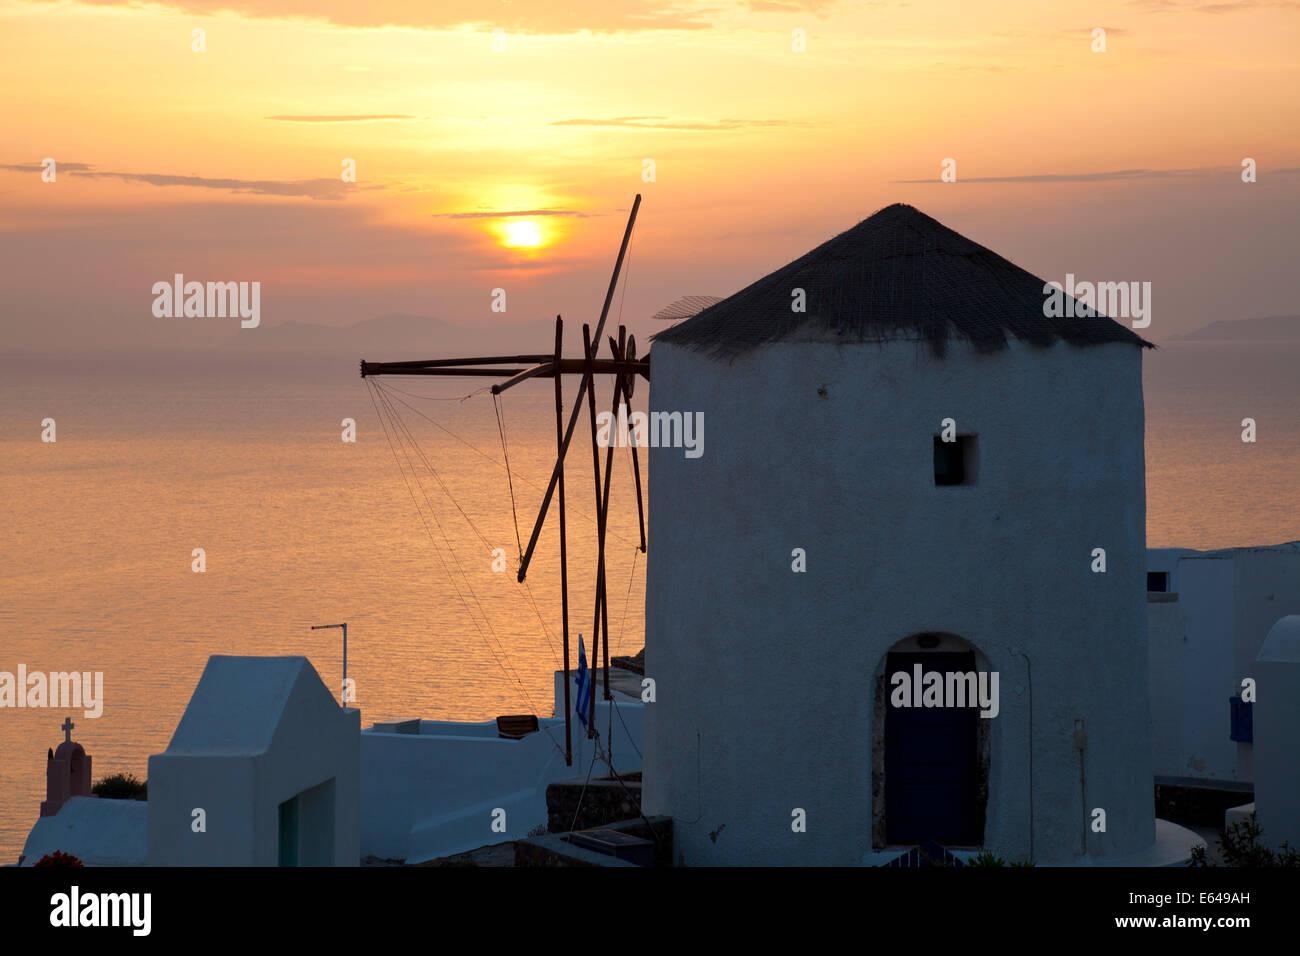 Windmühle bei Sonnenuntergang, Oia, Santorini, Kykladen, Griechenland Stockbild